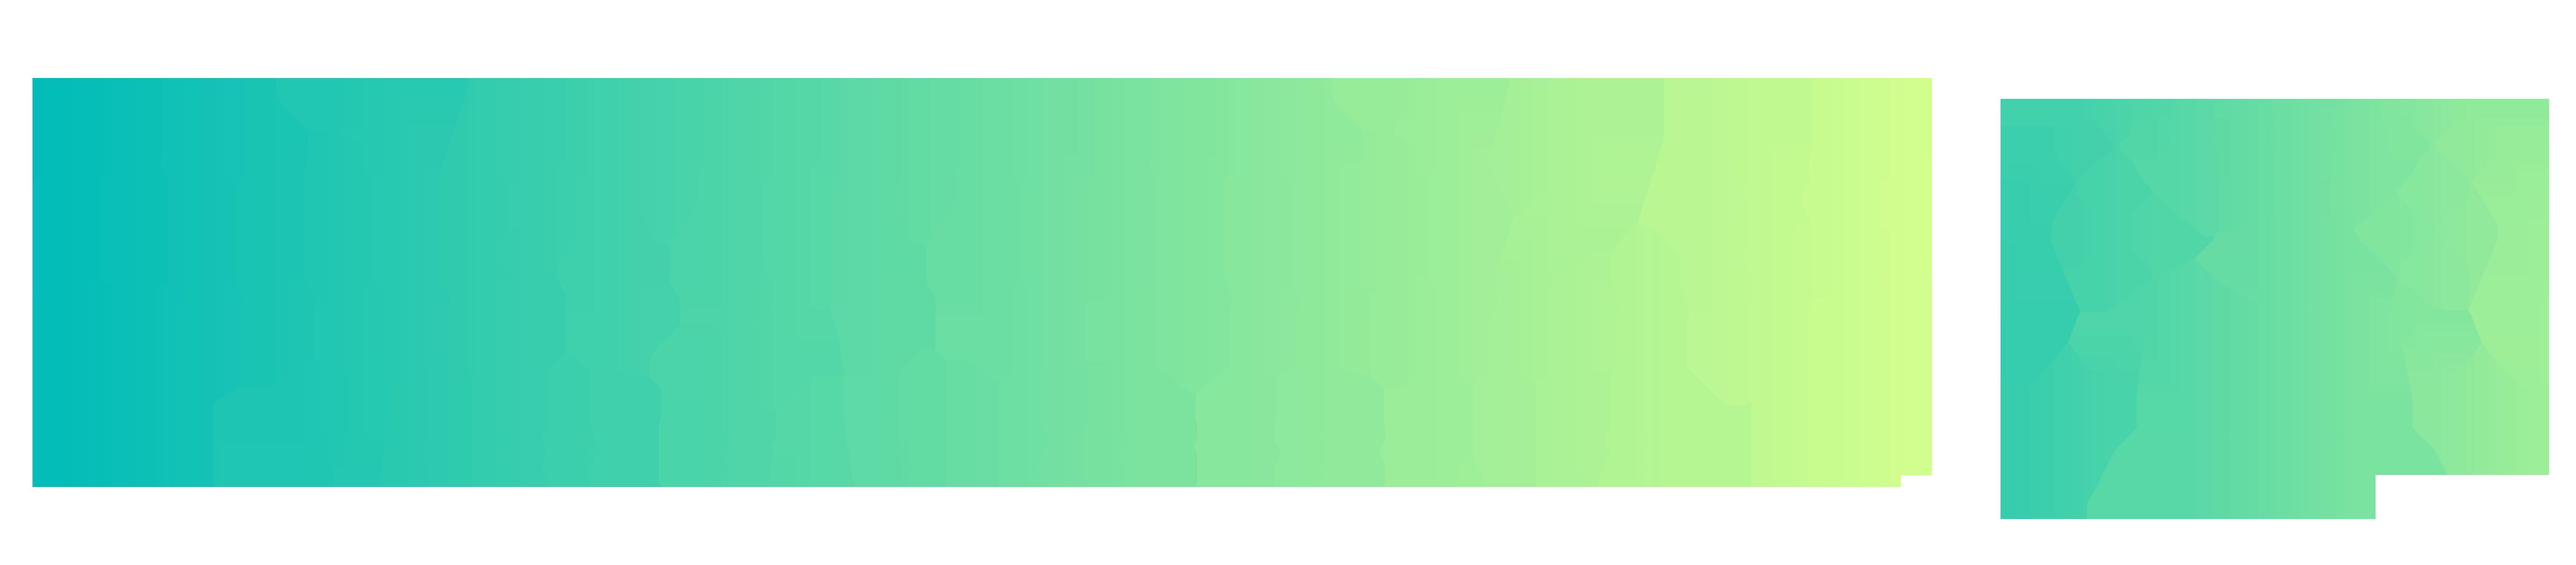 Undergroundz